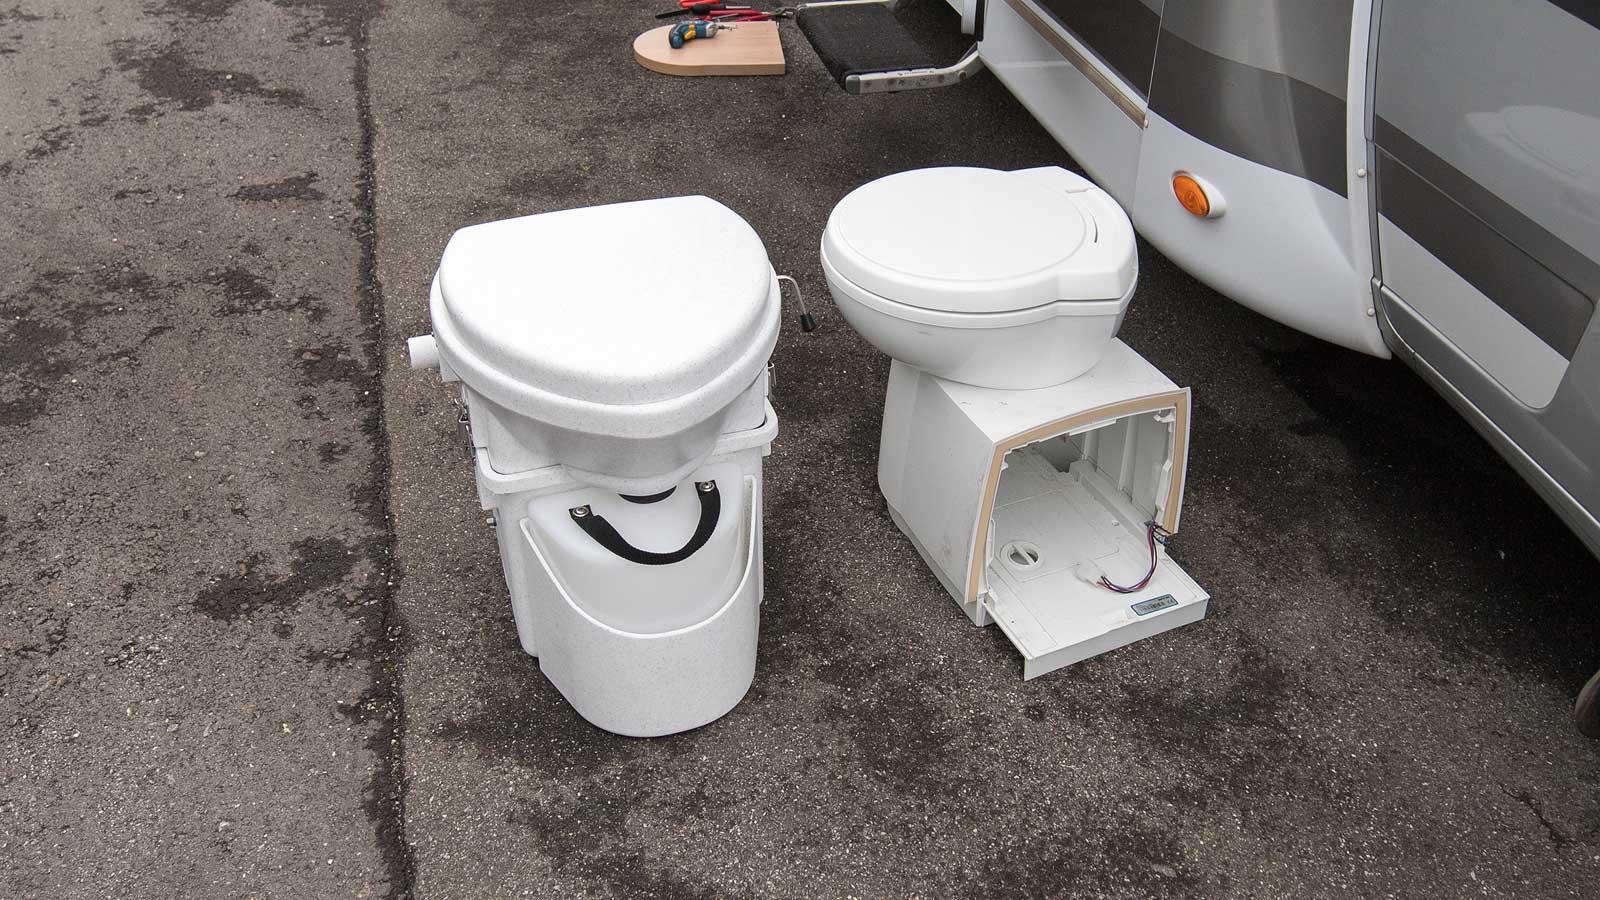 toilette einbauen toilette einbauen aquaclean sela stand wc anleitung toilette einbauen. Black Bedroom Furniture Sets. Home Design Ideas